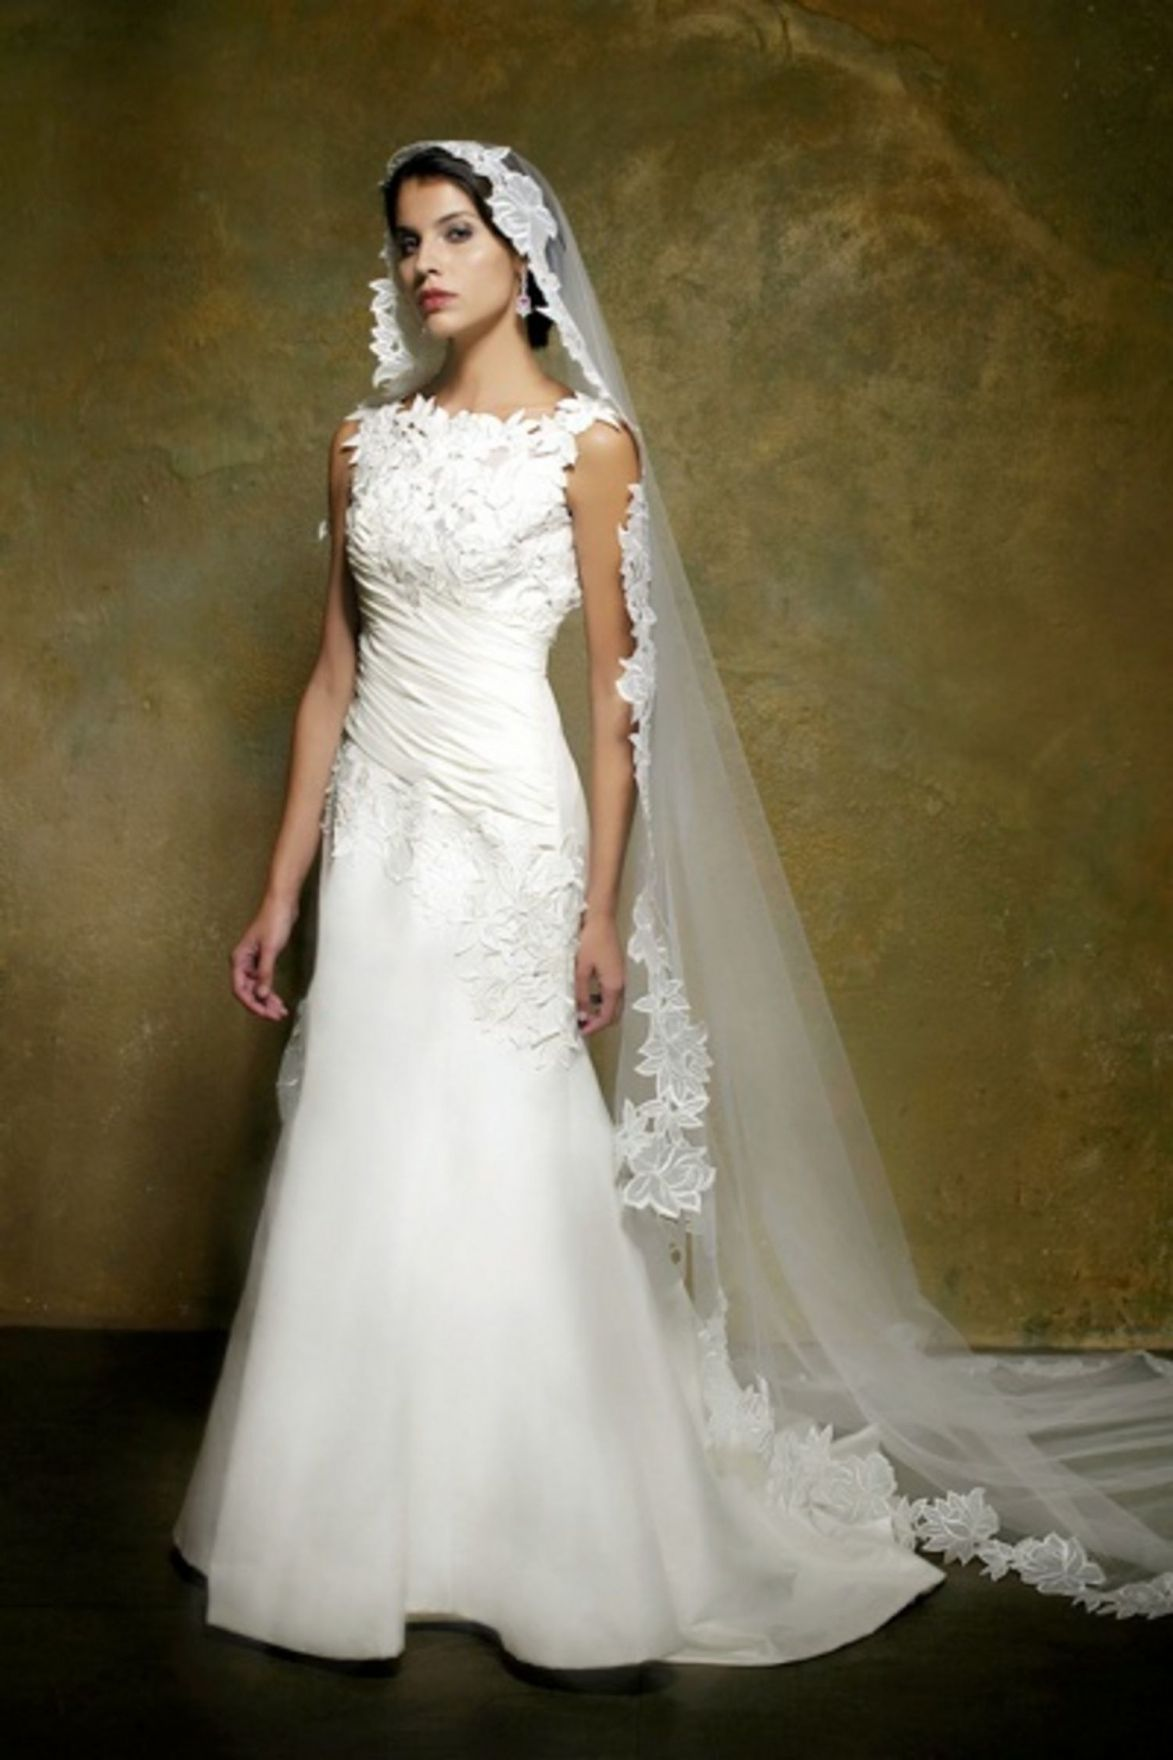 100+ Designer Wedding Dresses for Sale - Wedding Dresses for Fall ...